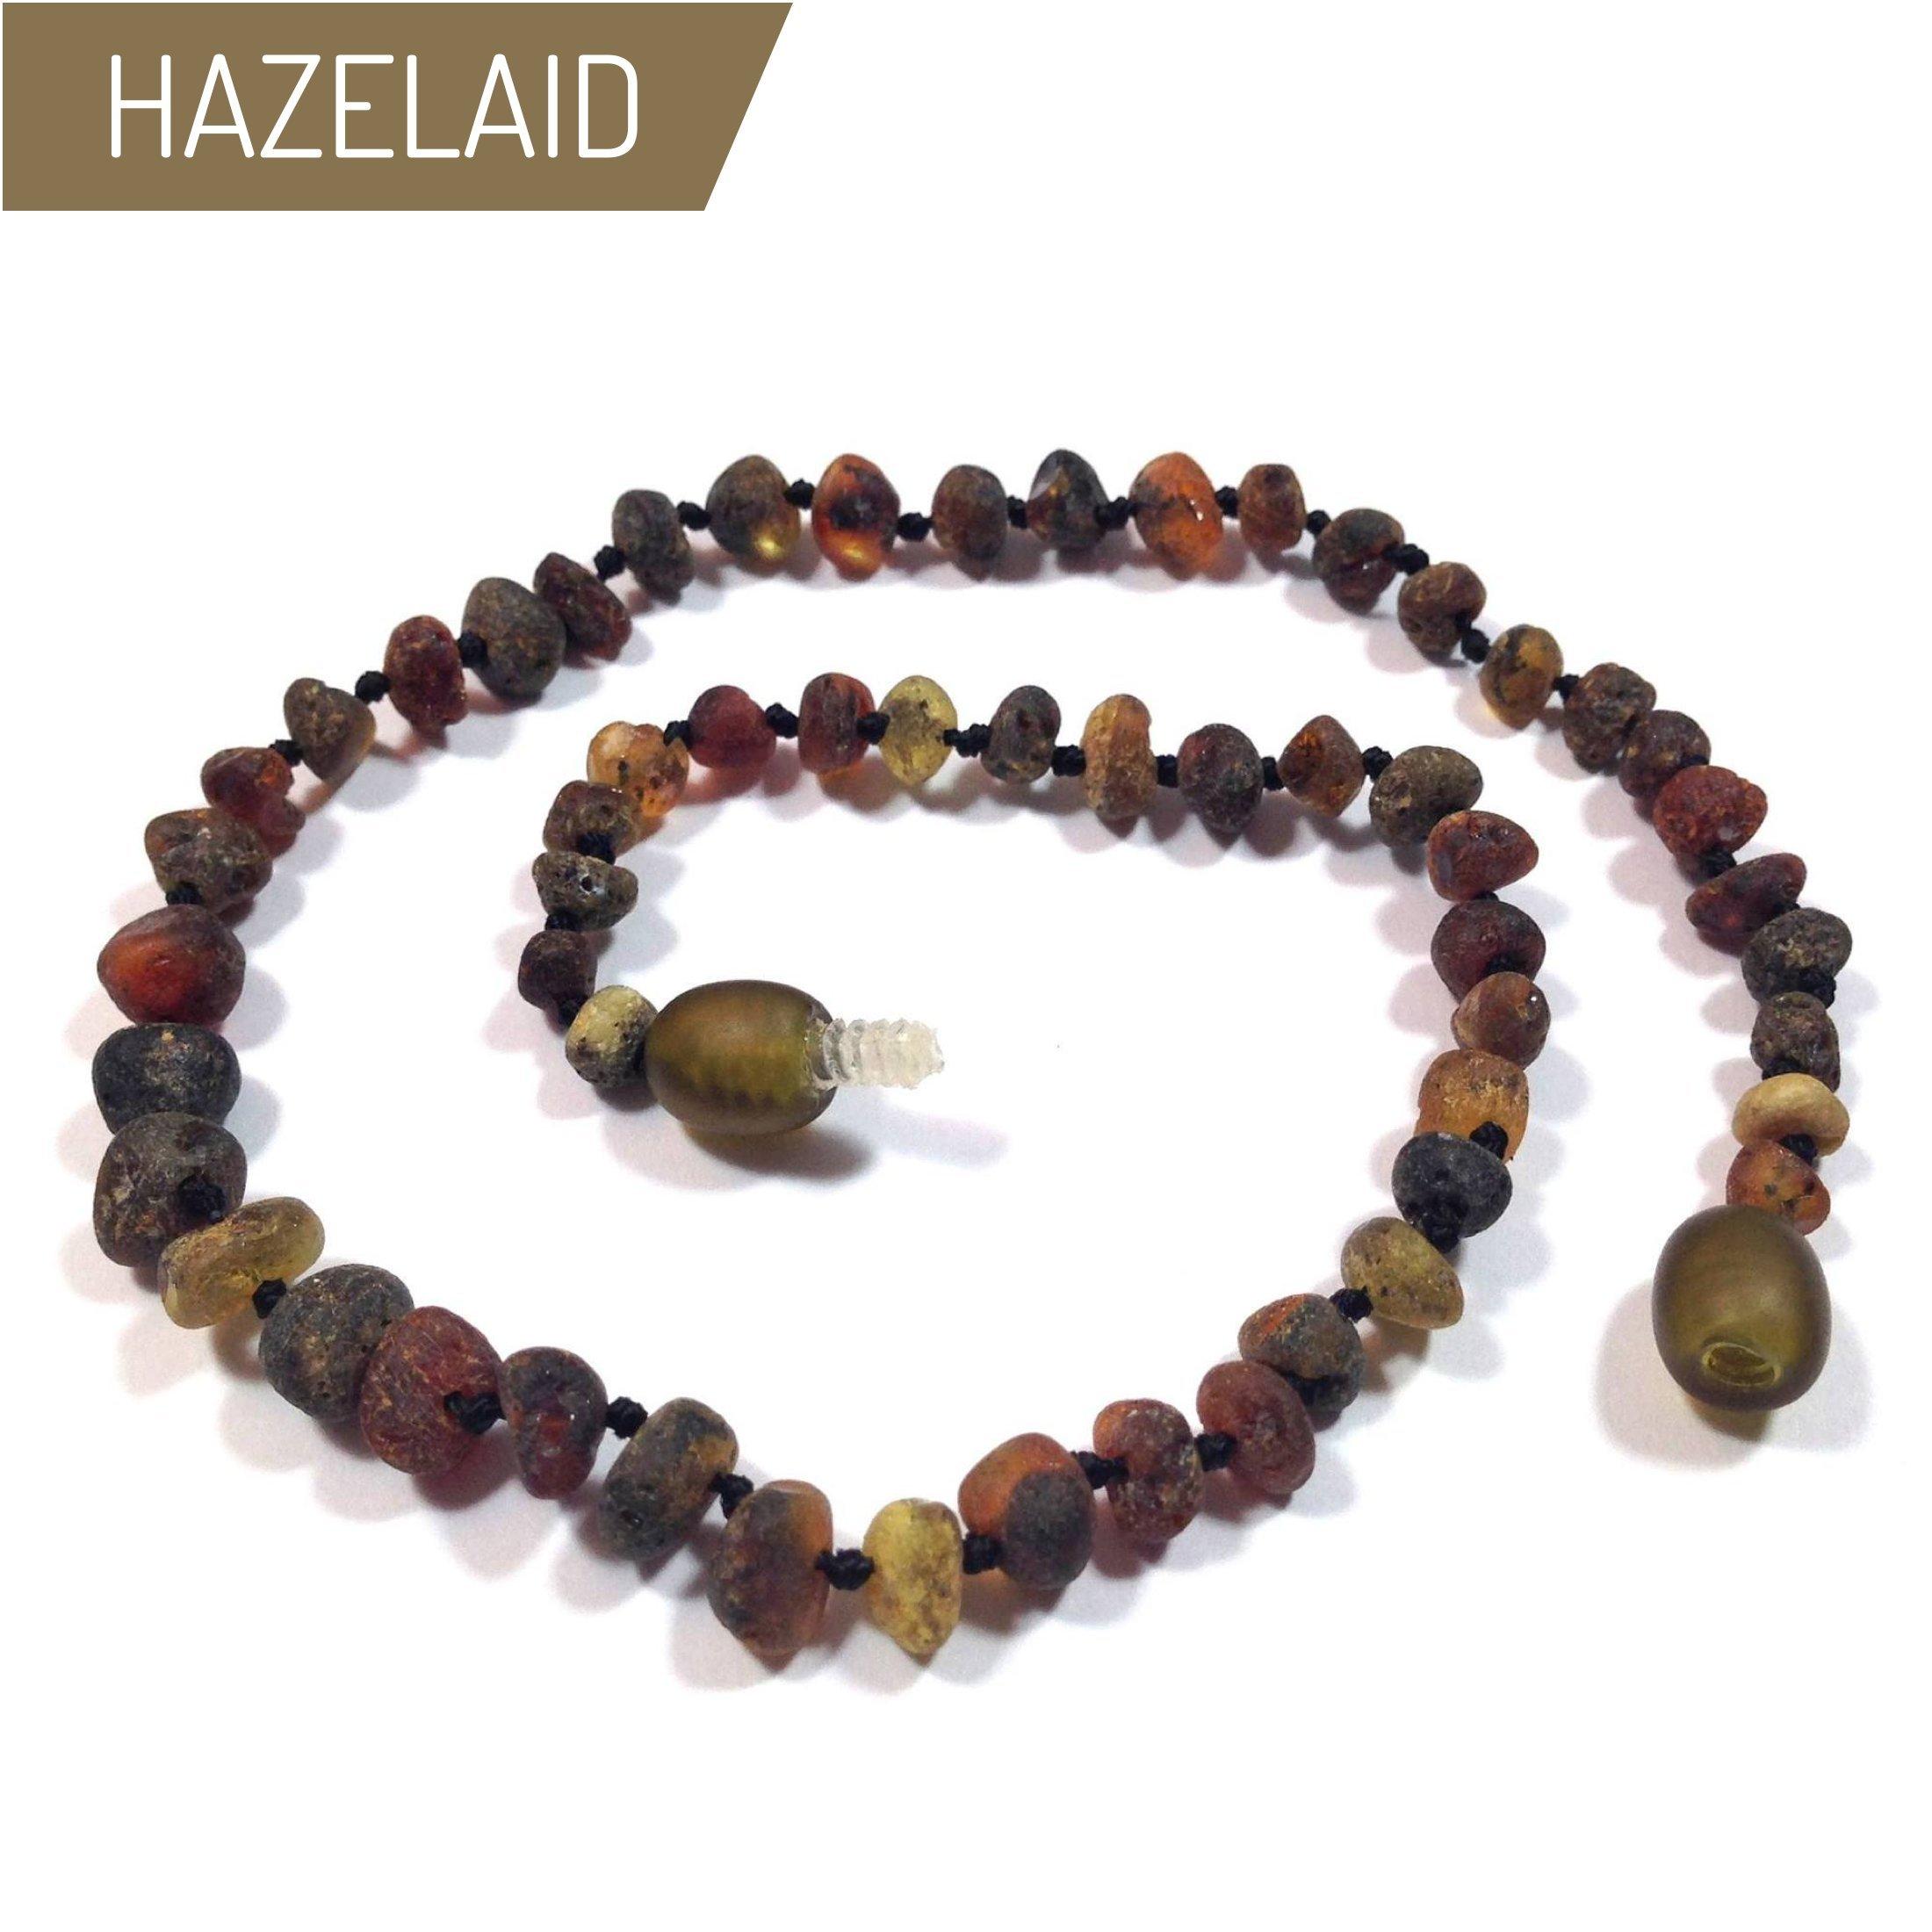 Hazelaid (TM) 12'' Twist-Clasp Baltic Amber Asteroid Necklace